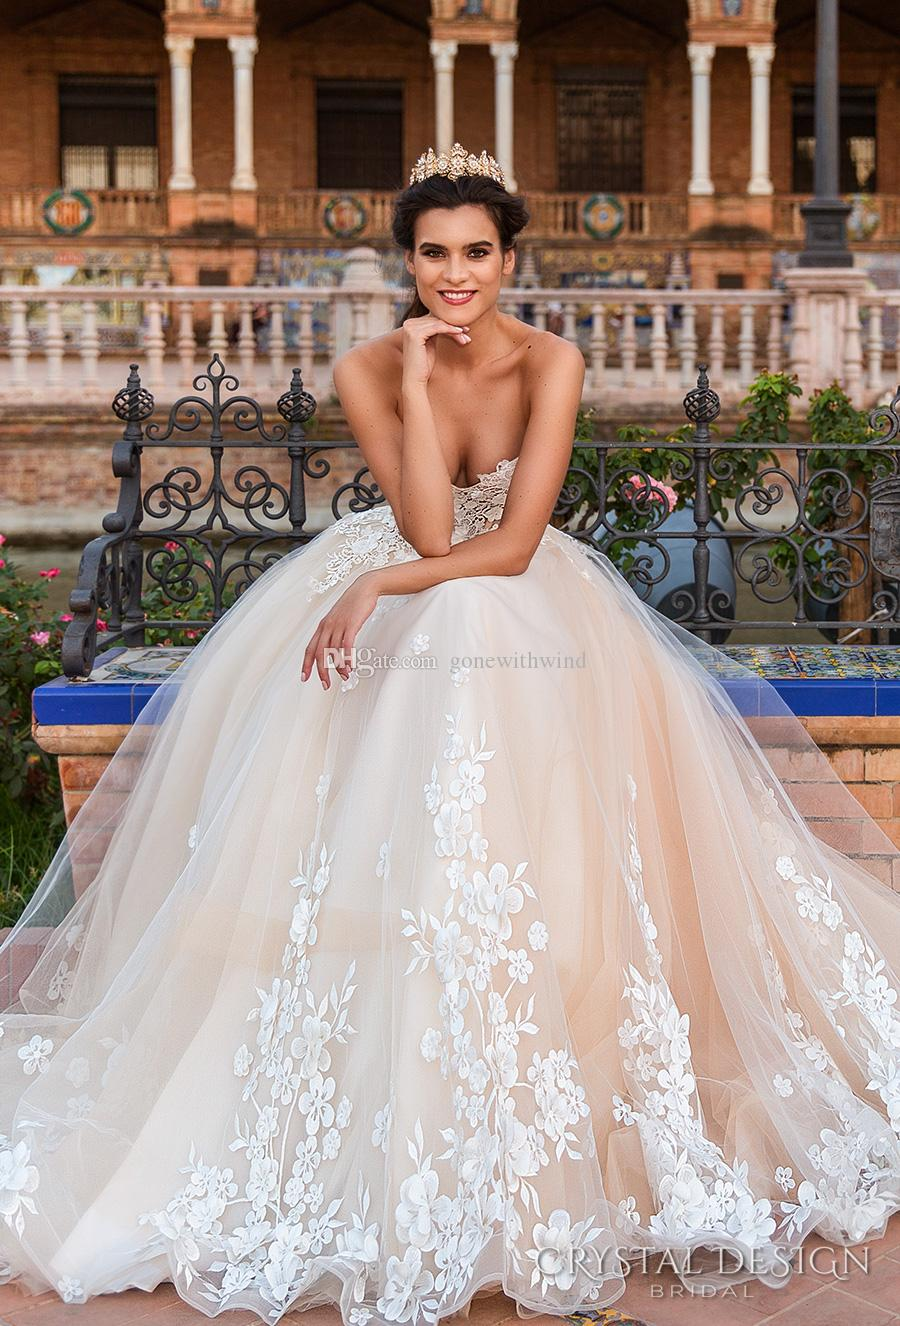 Acheter Corset Princesse Robes De Mariée Robe De Mariée 2017 Design ...